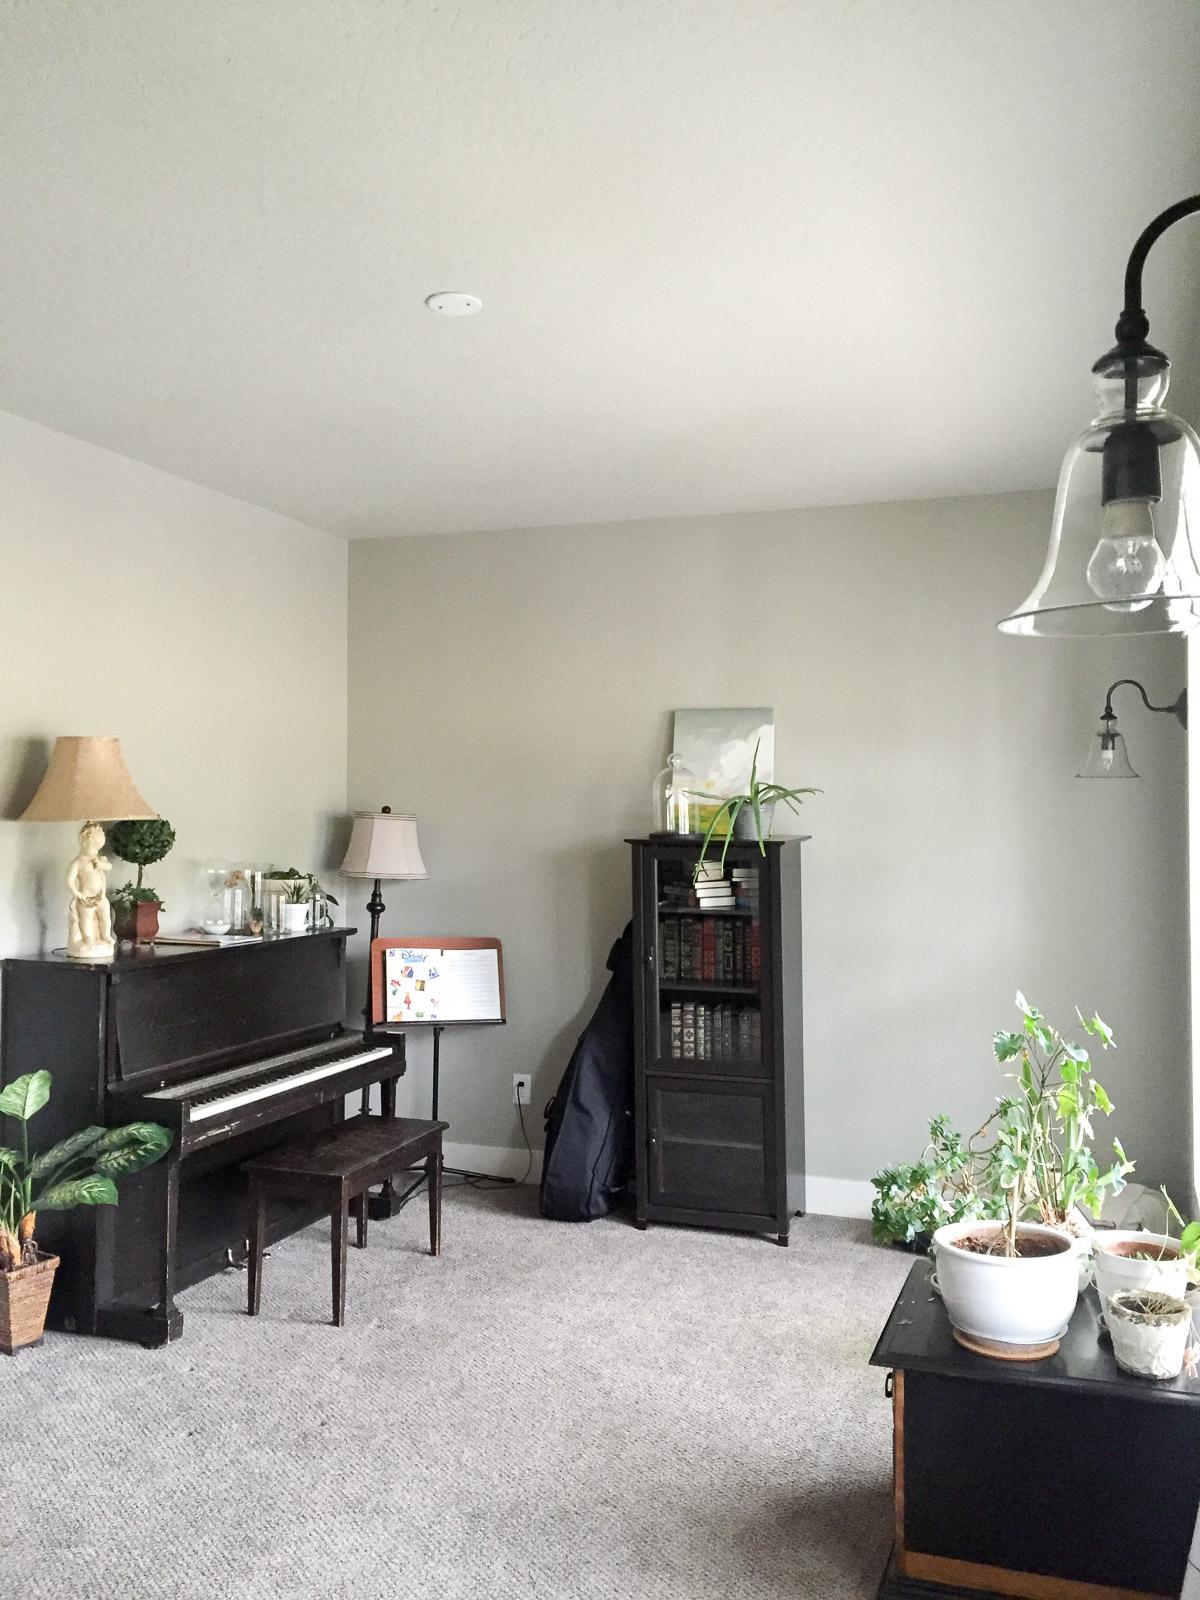 One Room Challenge, Week 1: Living Room Makeover - Lulu the Baker